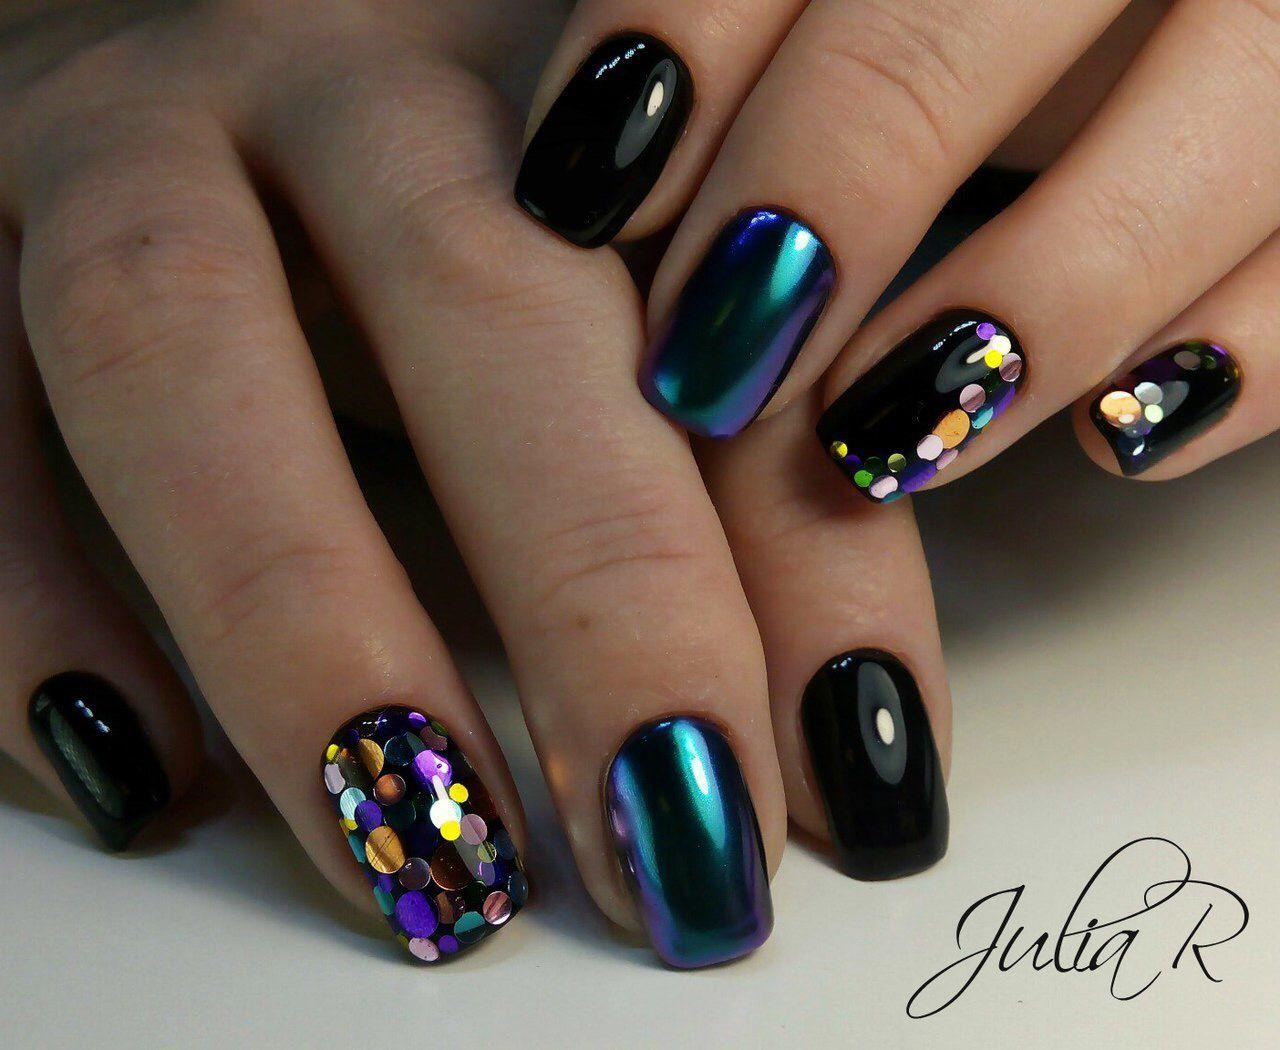 Pelikh Nailz Manicura De Uñas Uñas Negras Decoradas Y